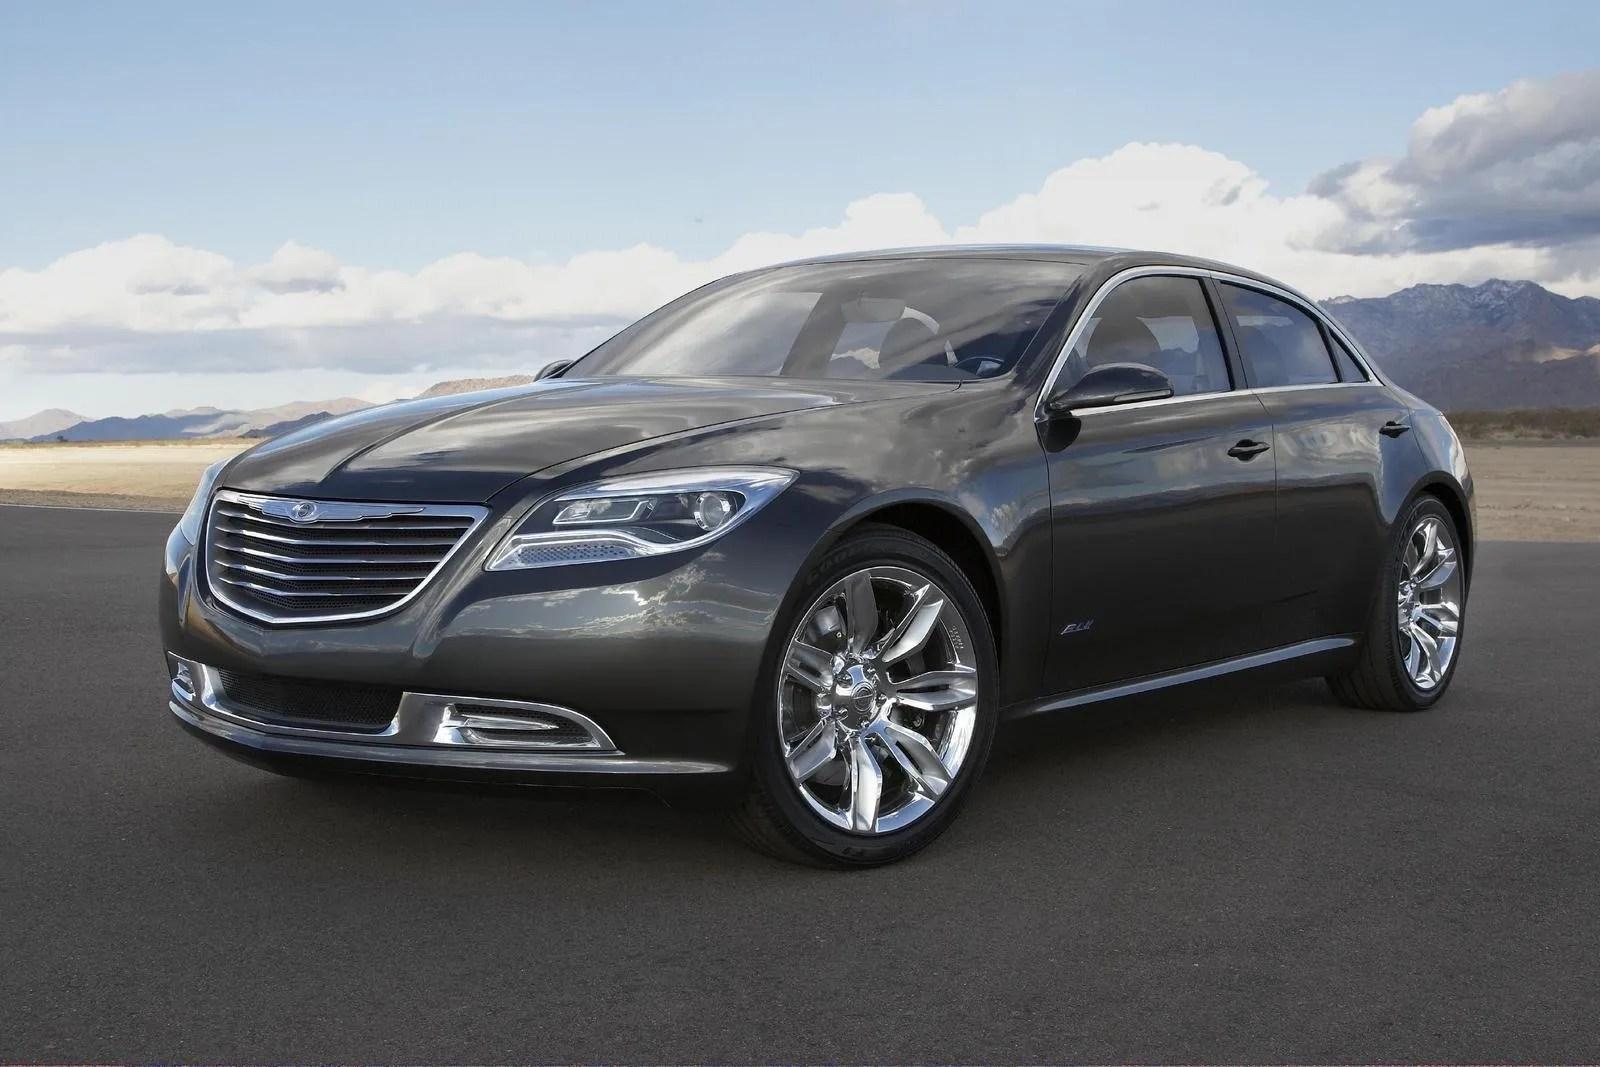 2009 Chrysler 200c Ev Concept Review  Top Speed